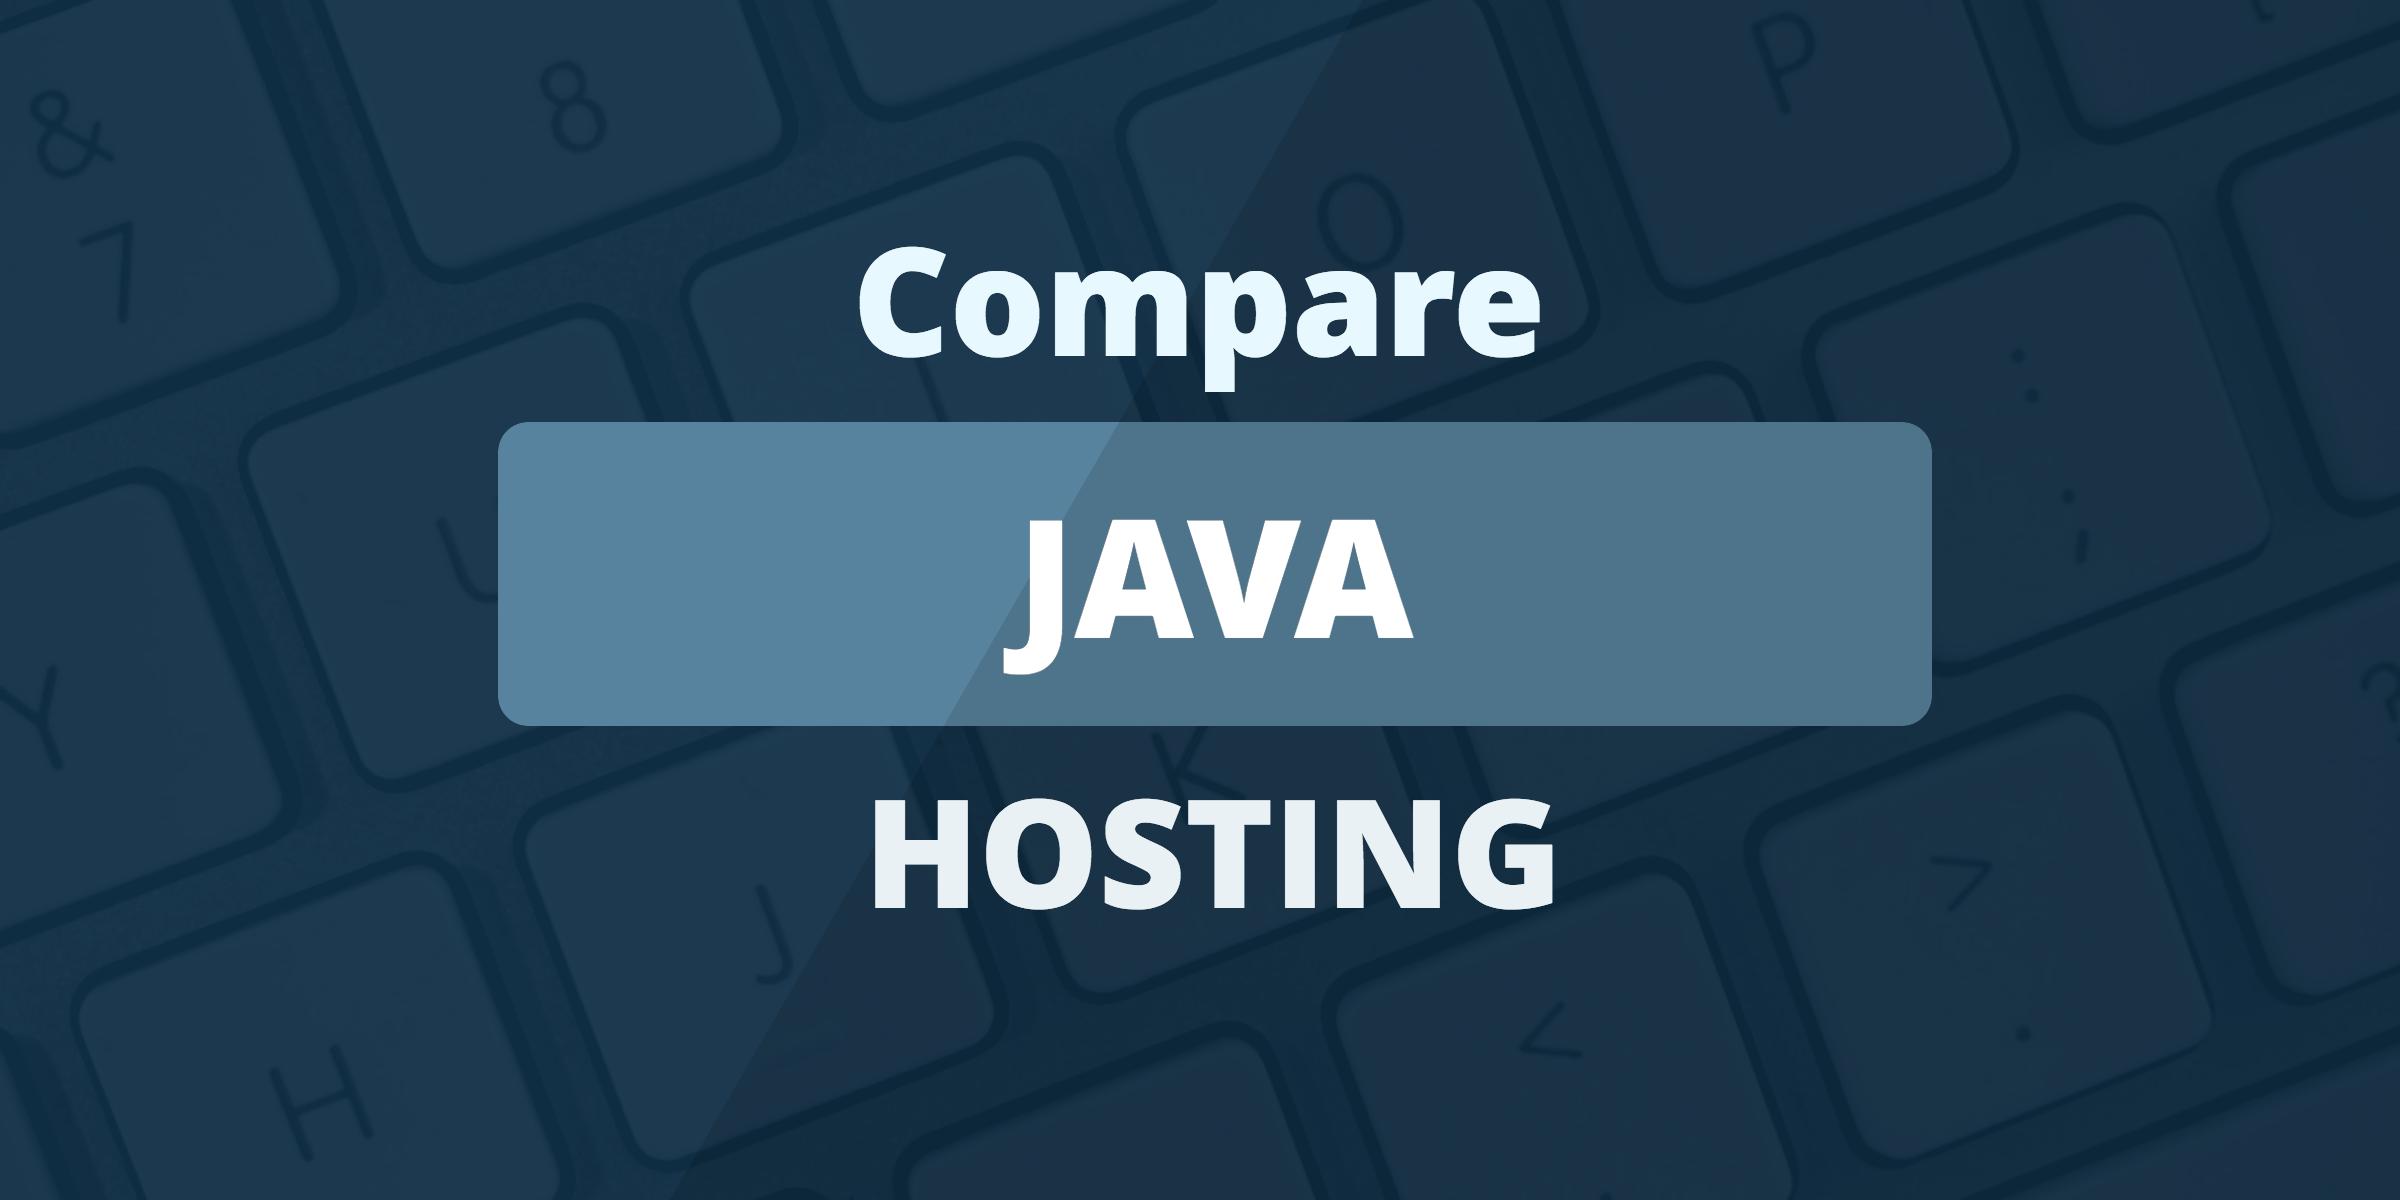 compare java hosting